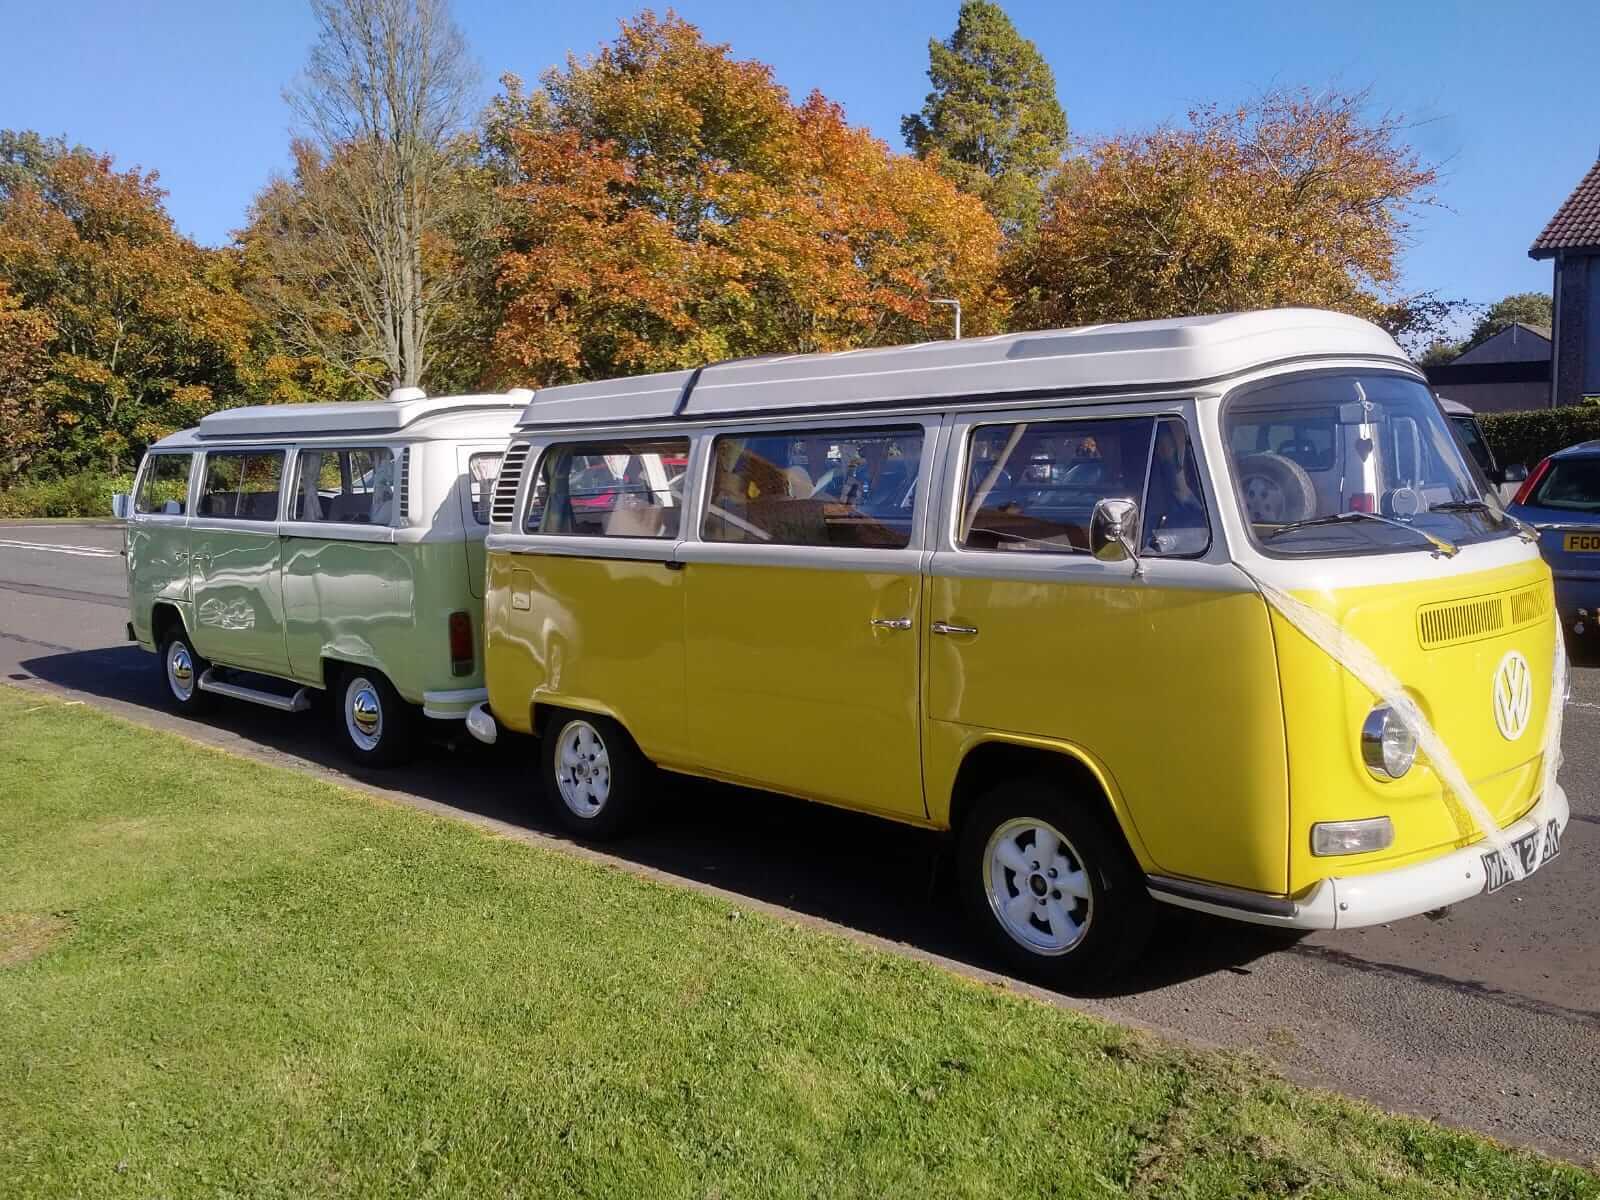 VW-camper-wedding-car-little-miss-sunshine-6.jpg